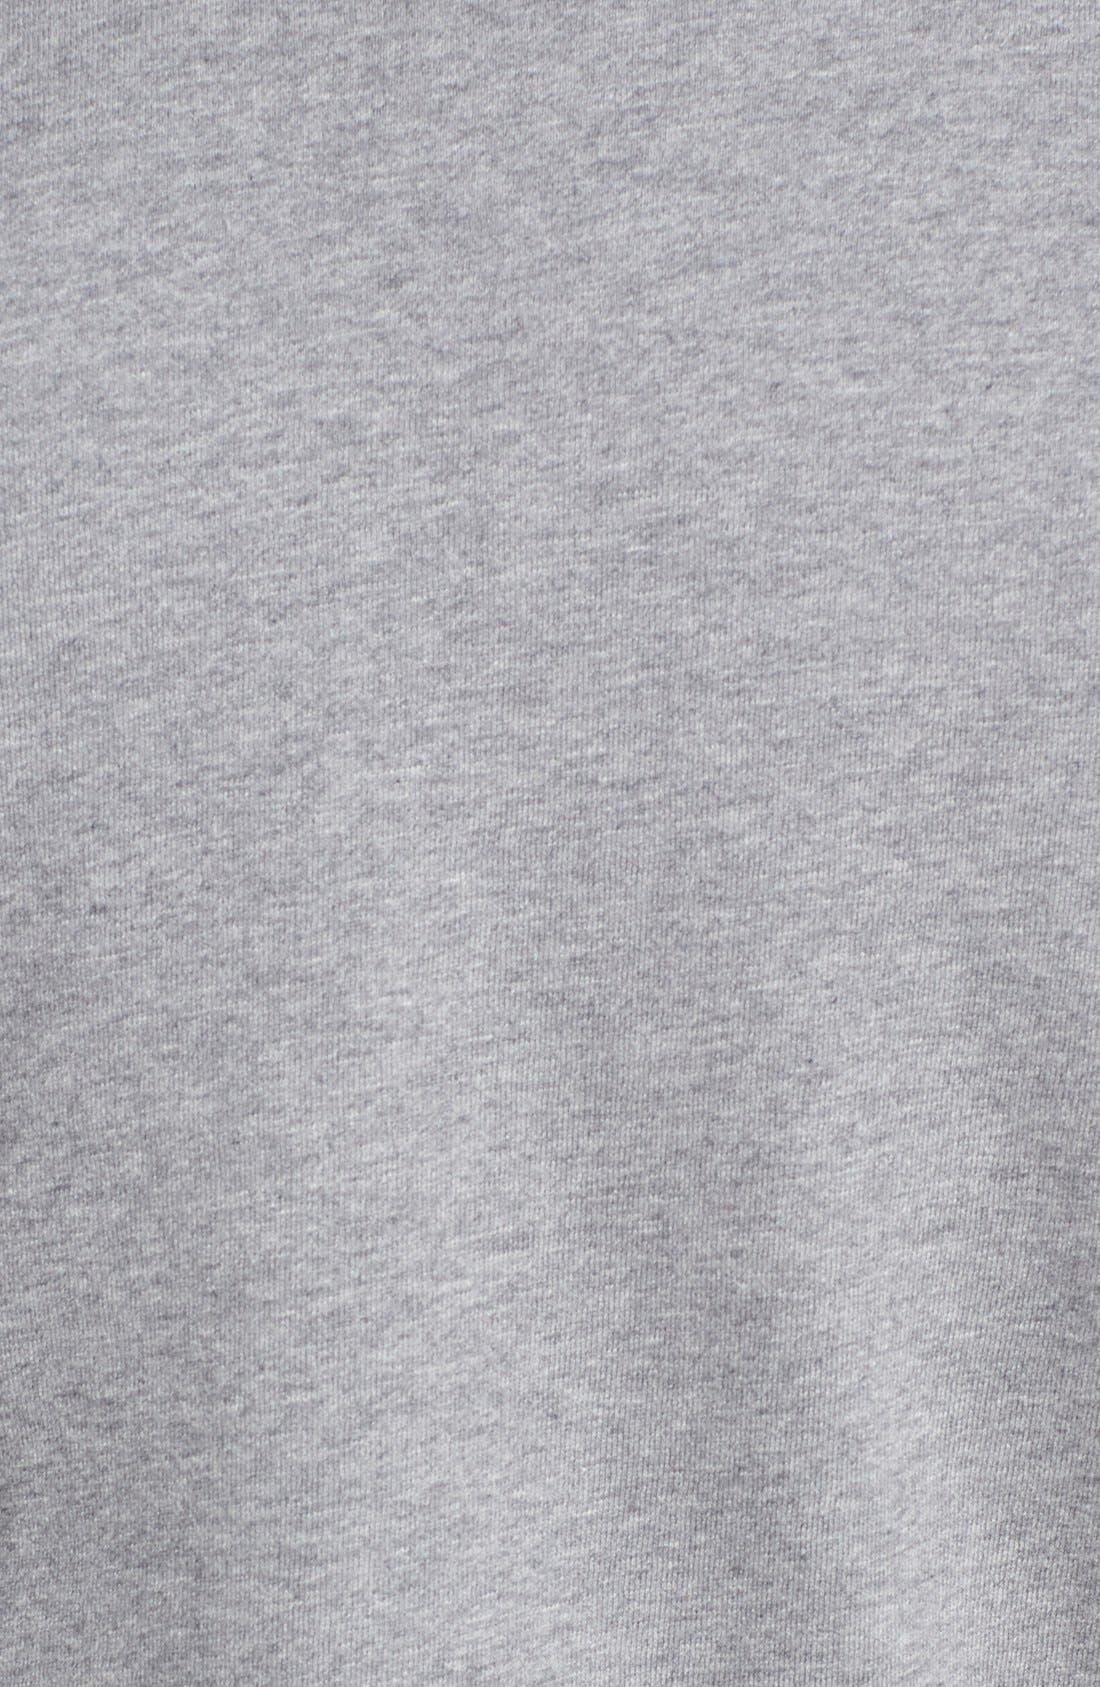 MITCHELL & NESS,                             Mitchell &Ness'Cleveland Browns' Tailored Fleece Crewneck Sweatshirt,                             Alternate thumbnail 4, color,                             061